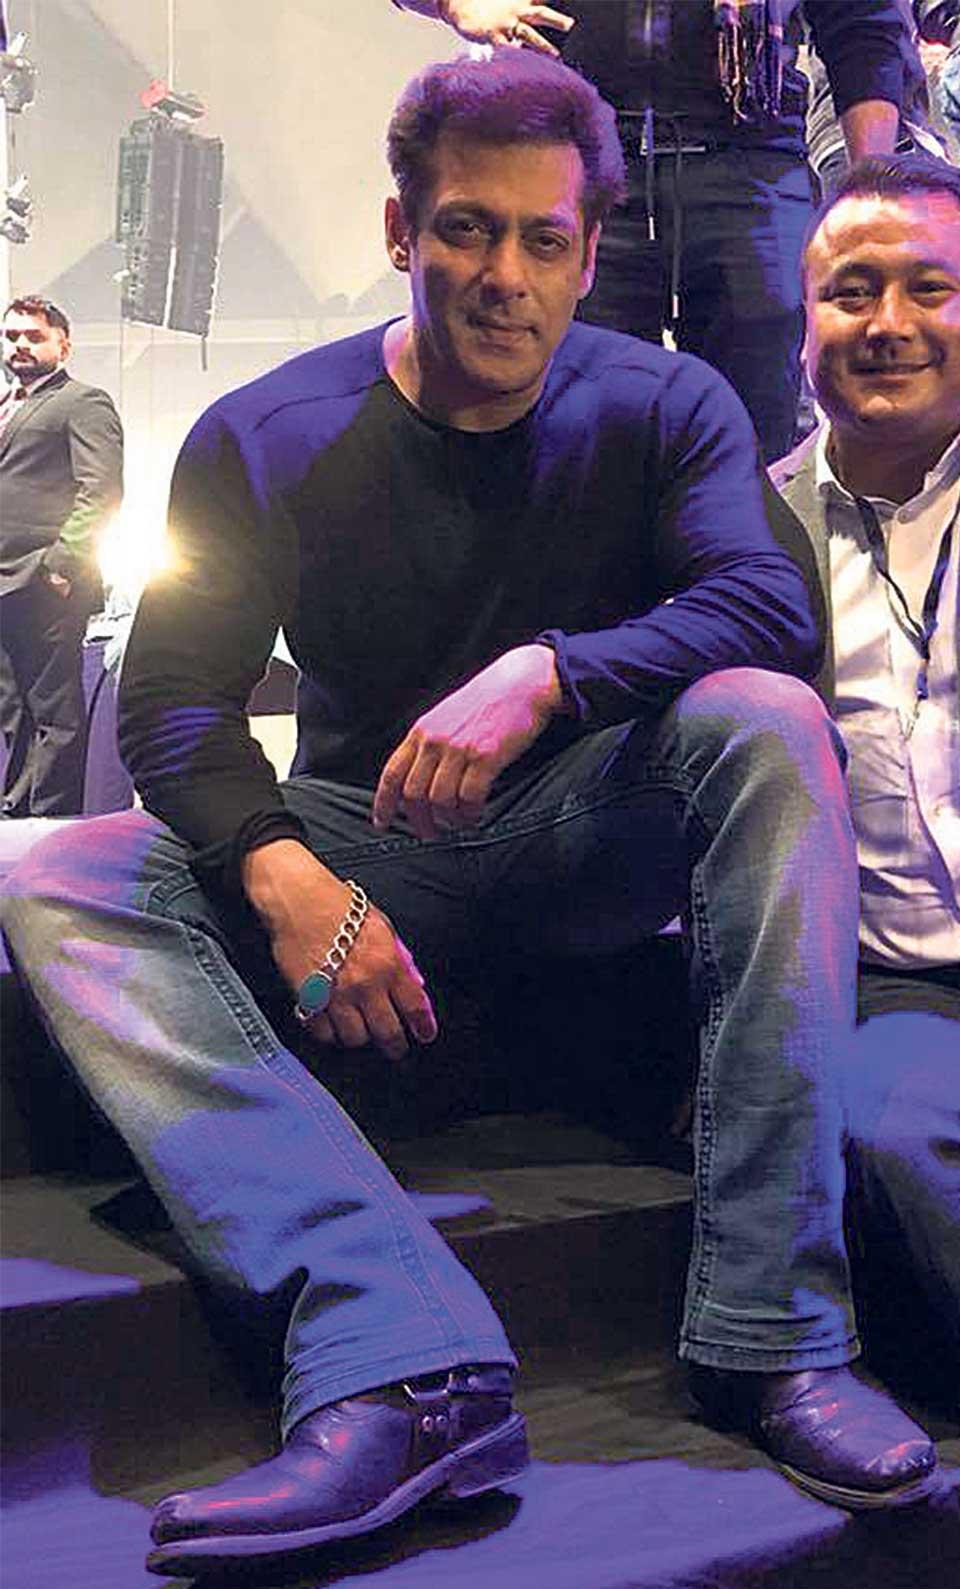 Salman to visit Nepal for Dabangg tour